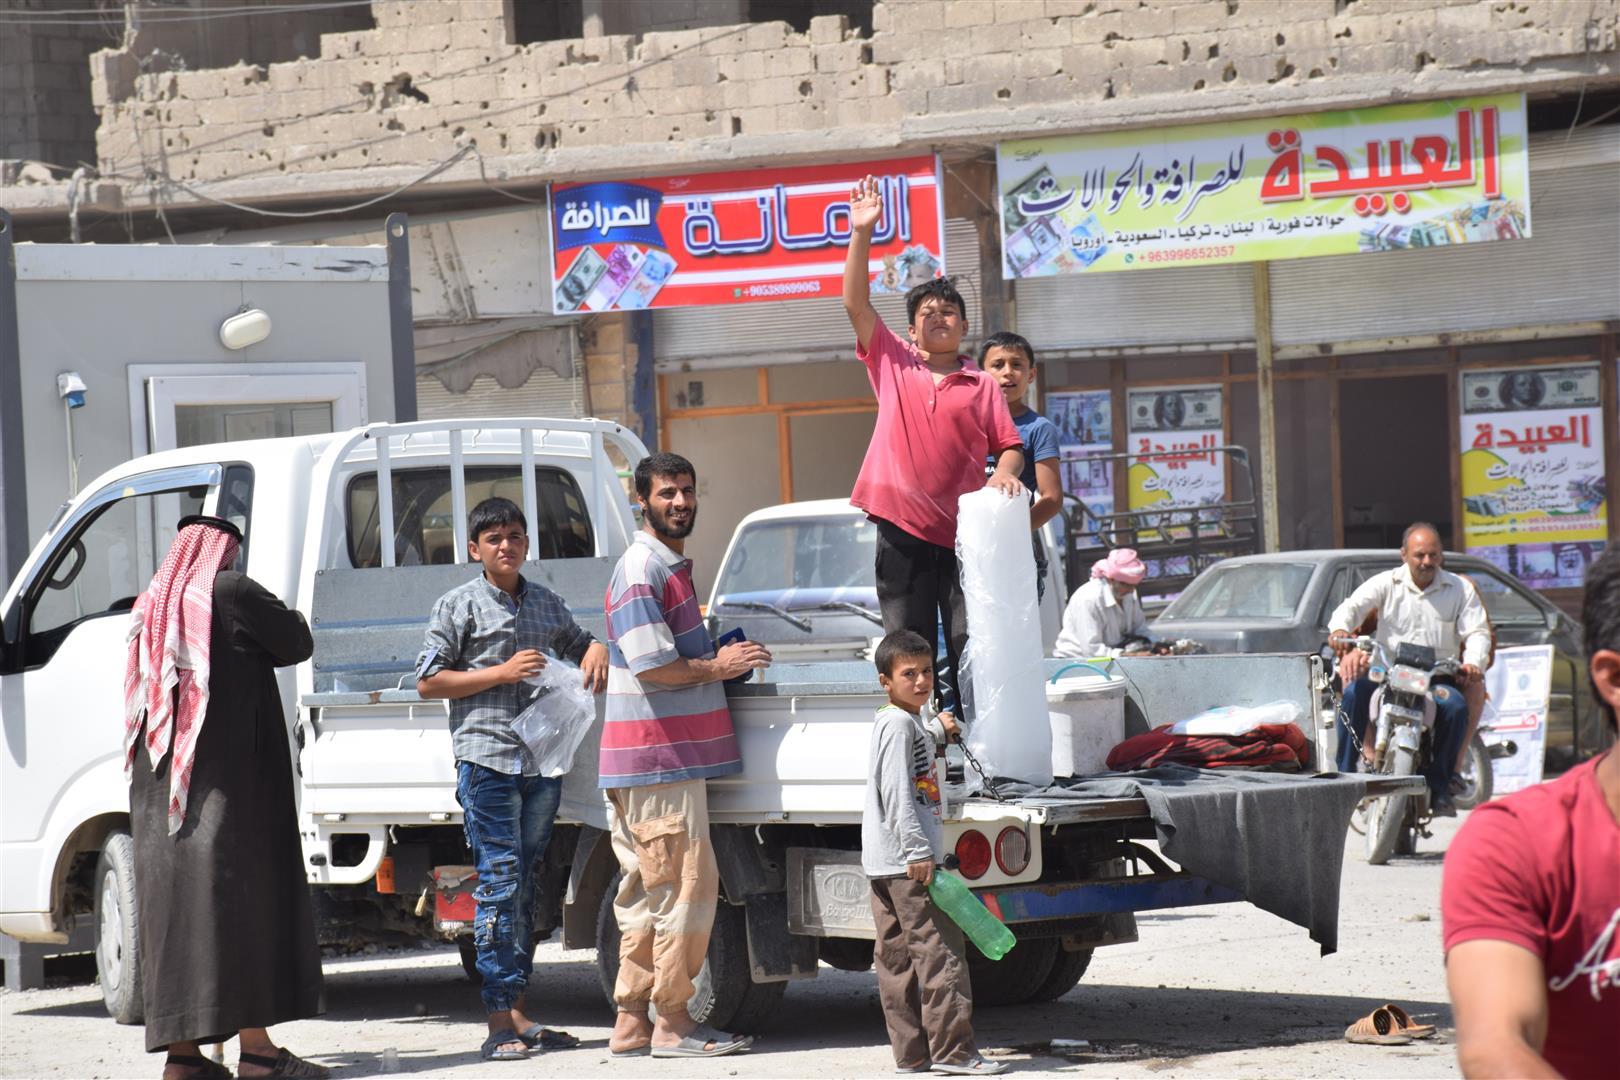 Normal life returned... How were sleeper cells eliminated in al-Raqqa?